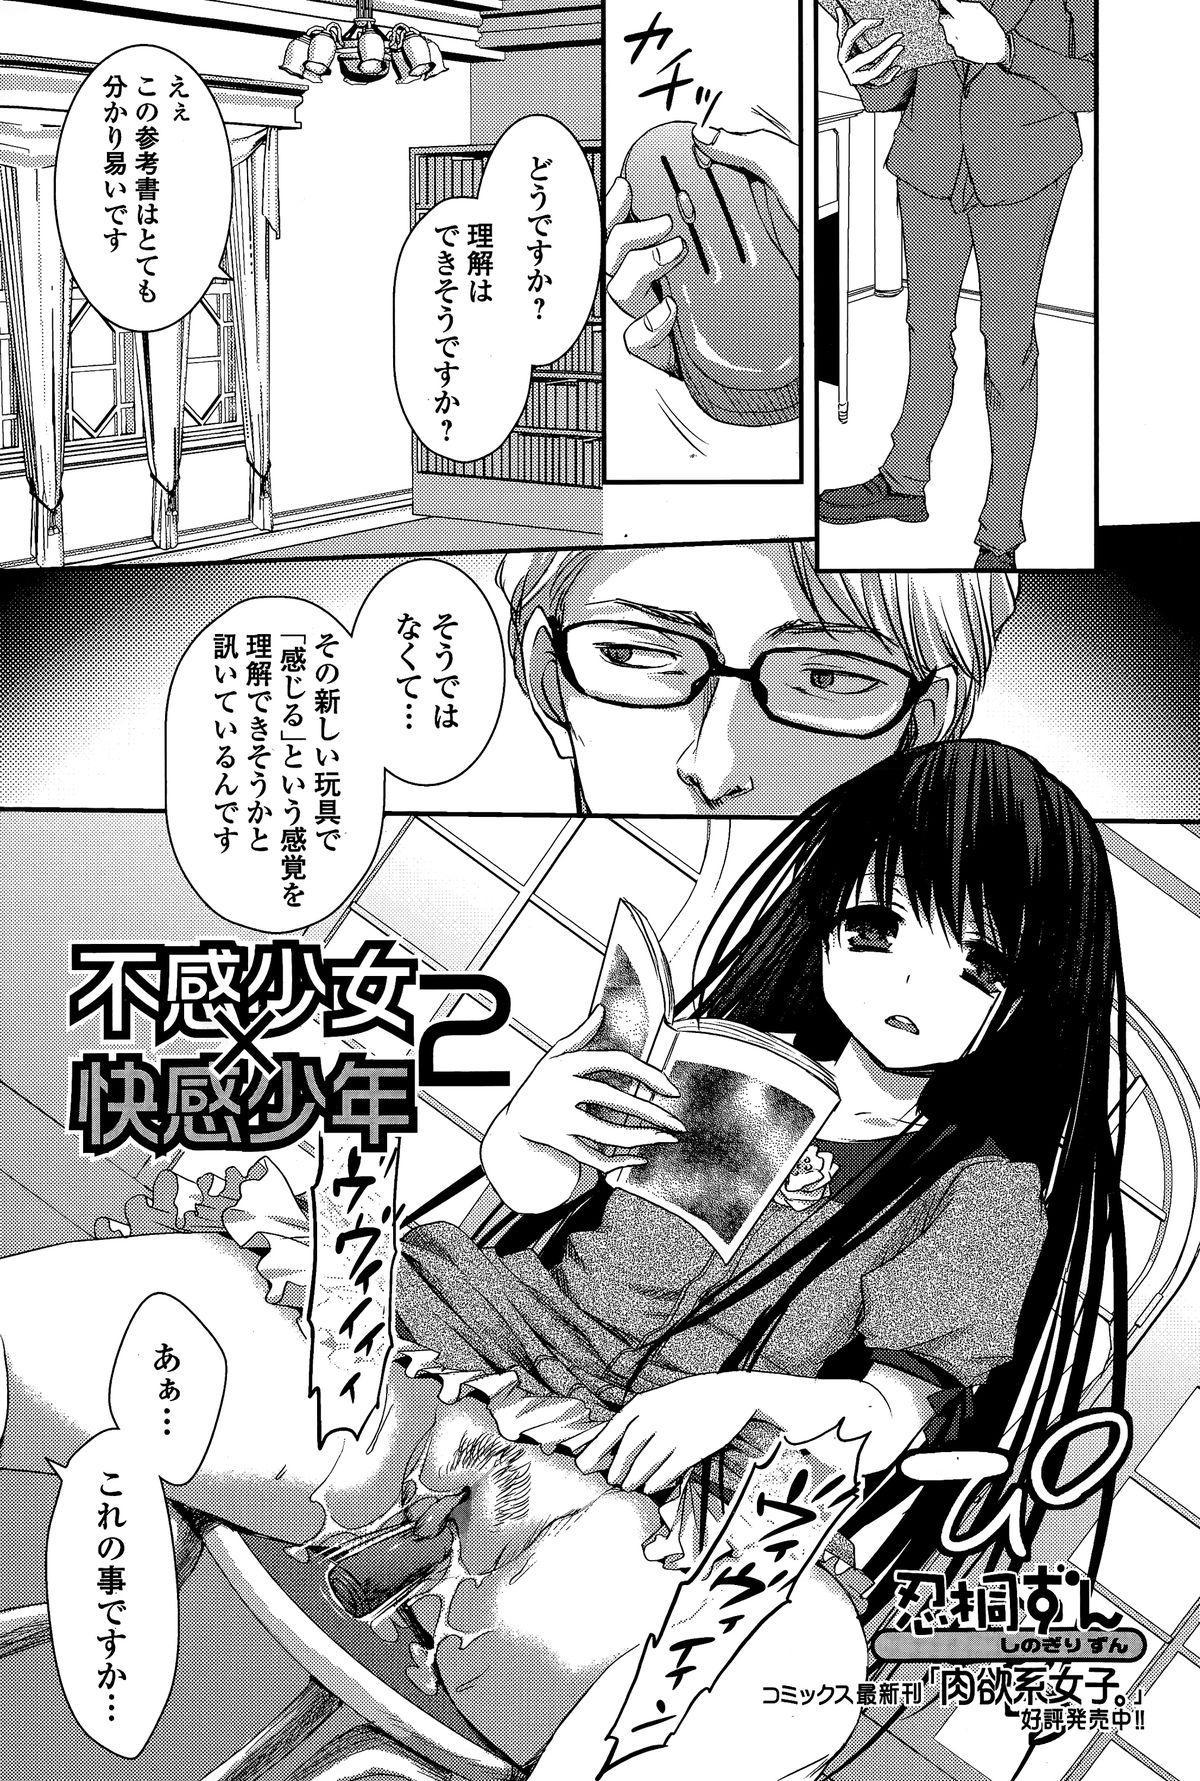 Comic Toutetsu 2015-02 Vol. 3 188